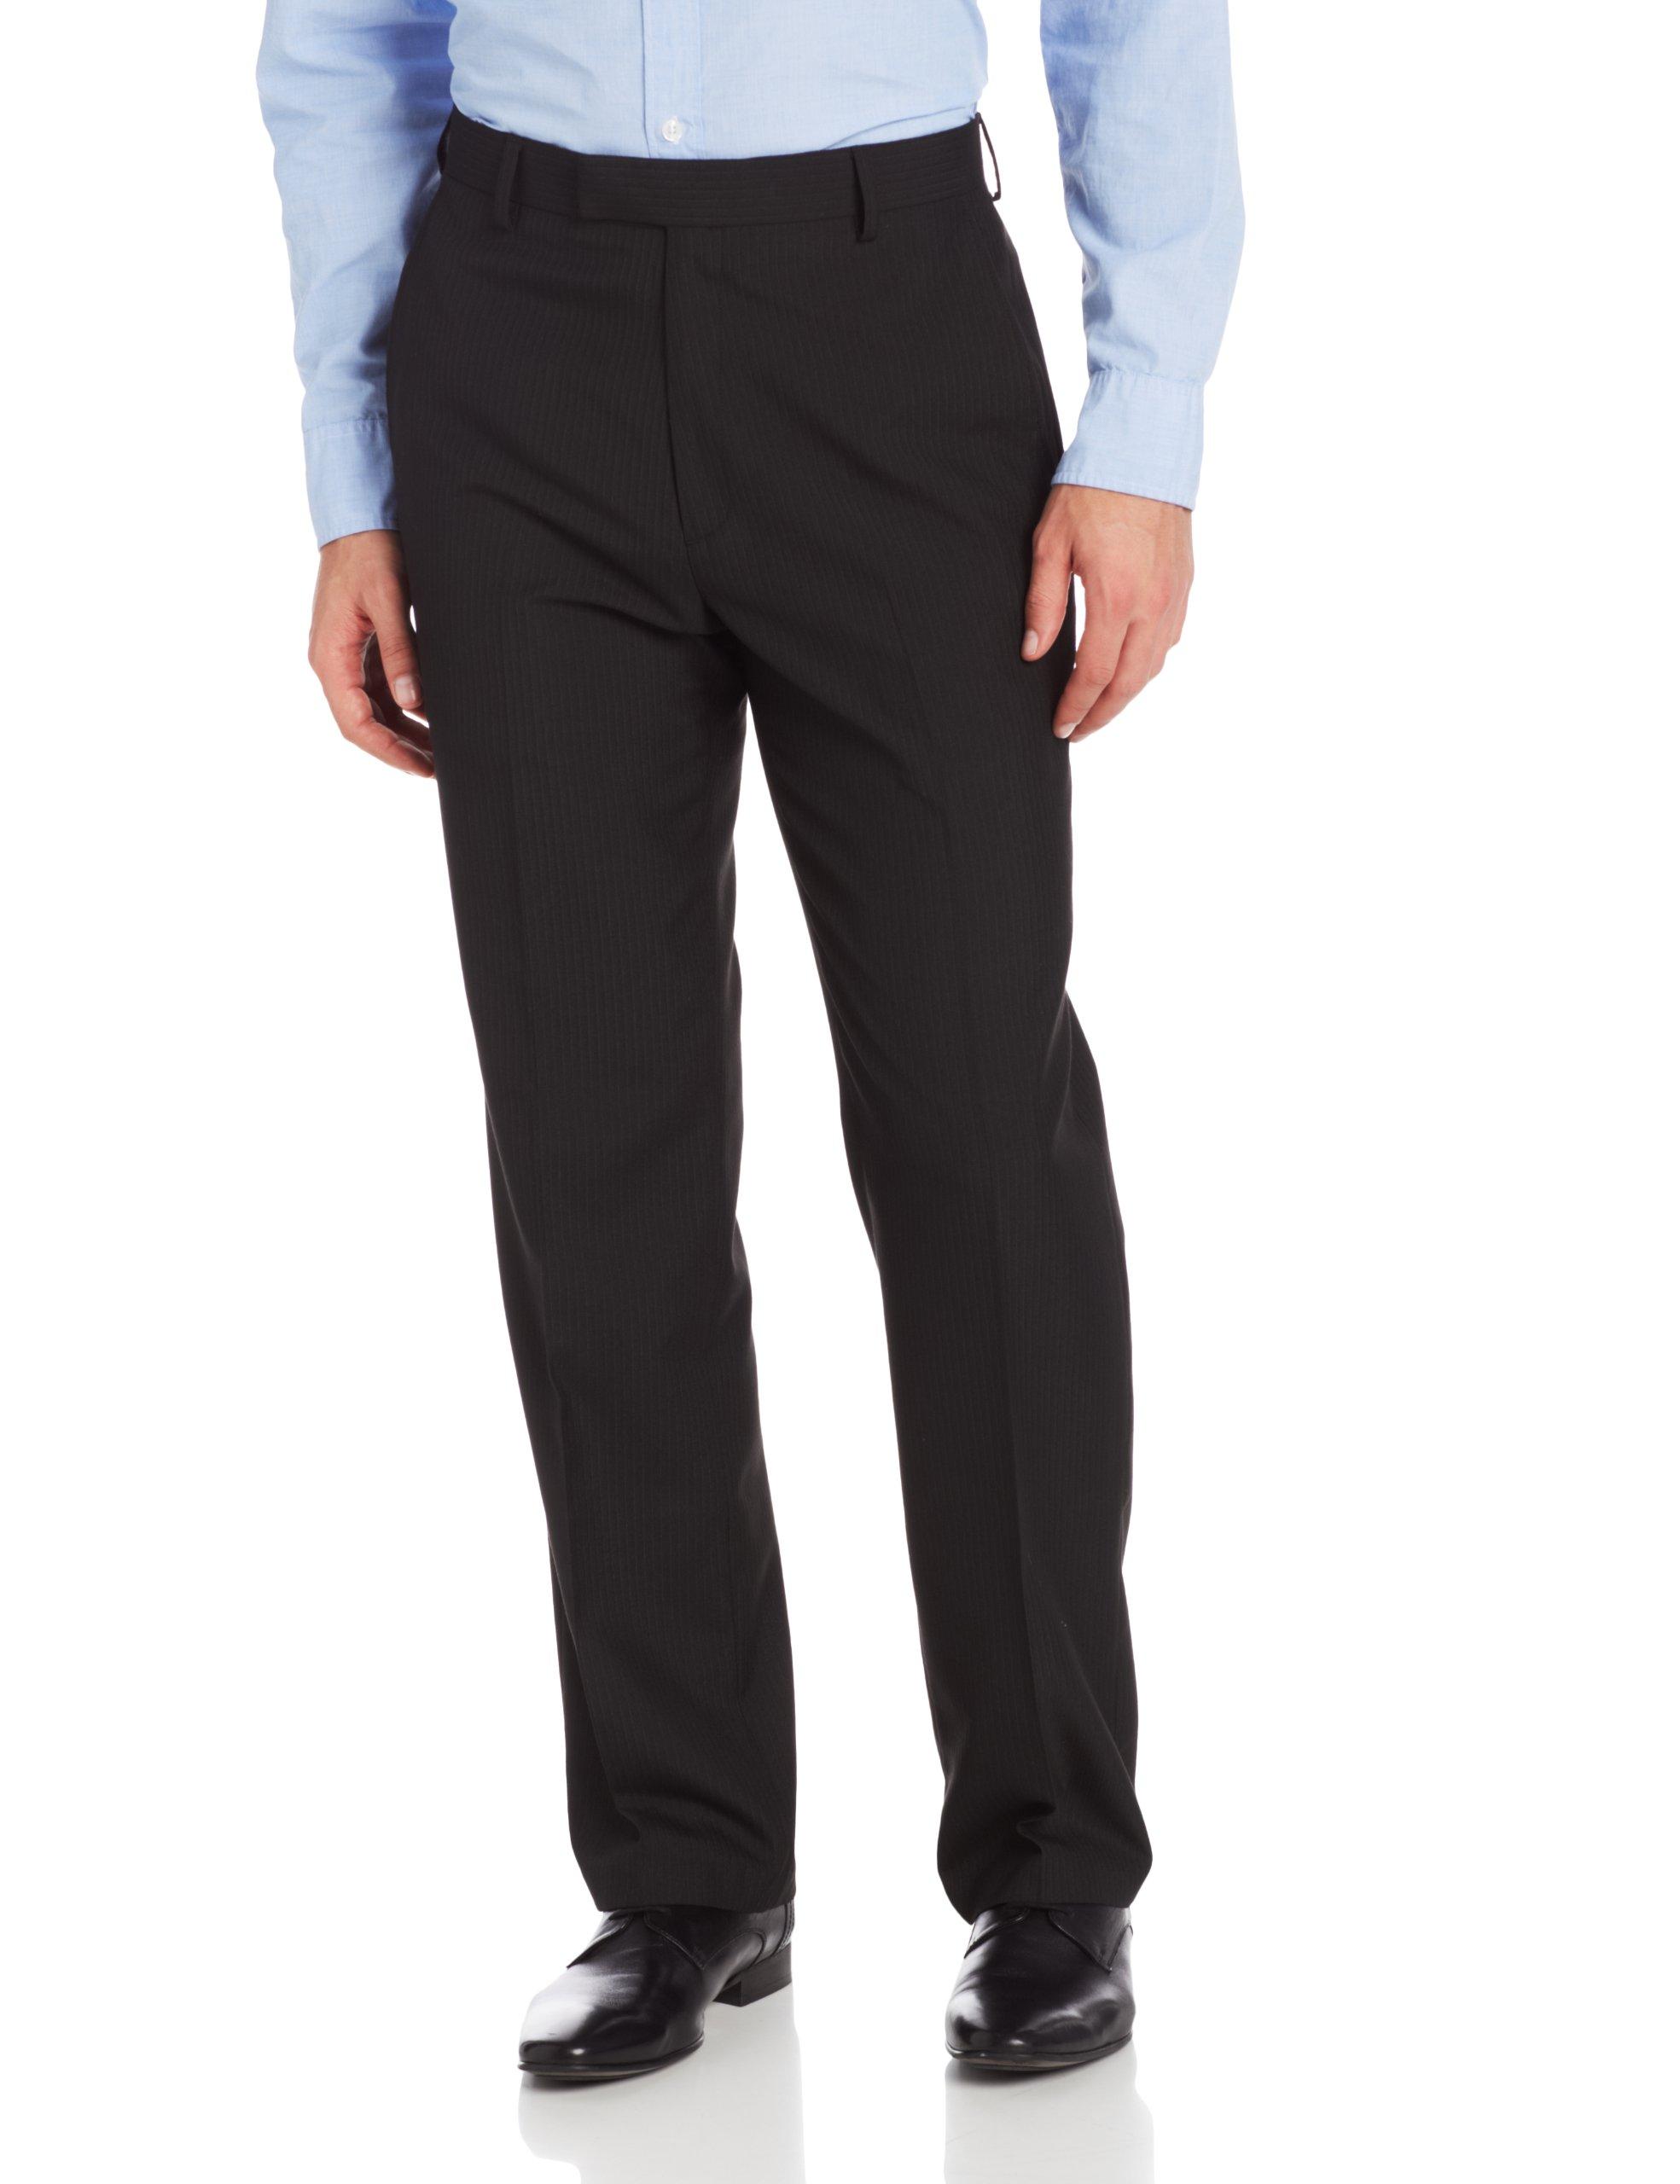 Haggar Men's Stripe Tailored Fit Plain Front Suit Separate Pant, Black, 32Wx29L by Haggar